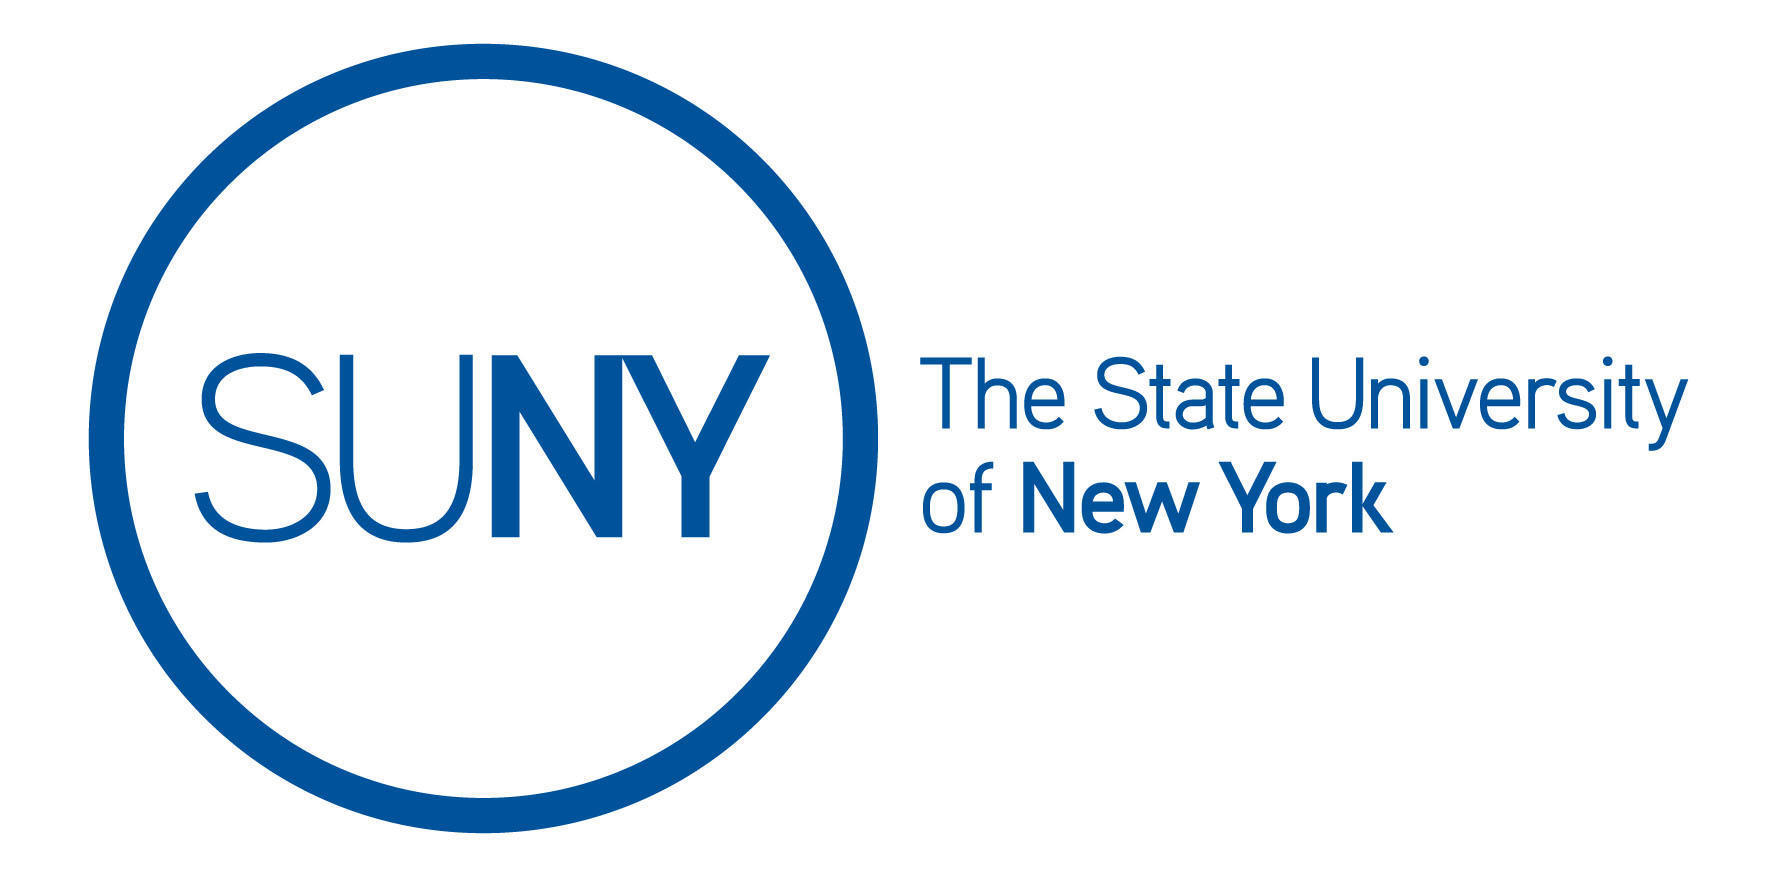 Suny logo 278